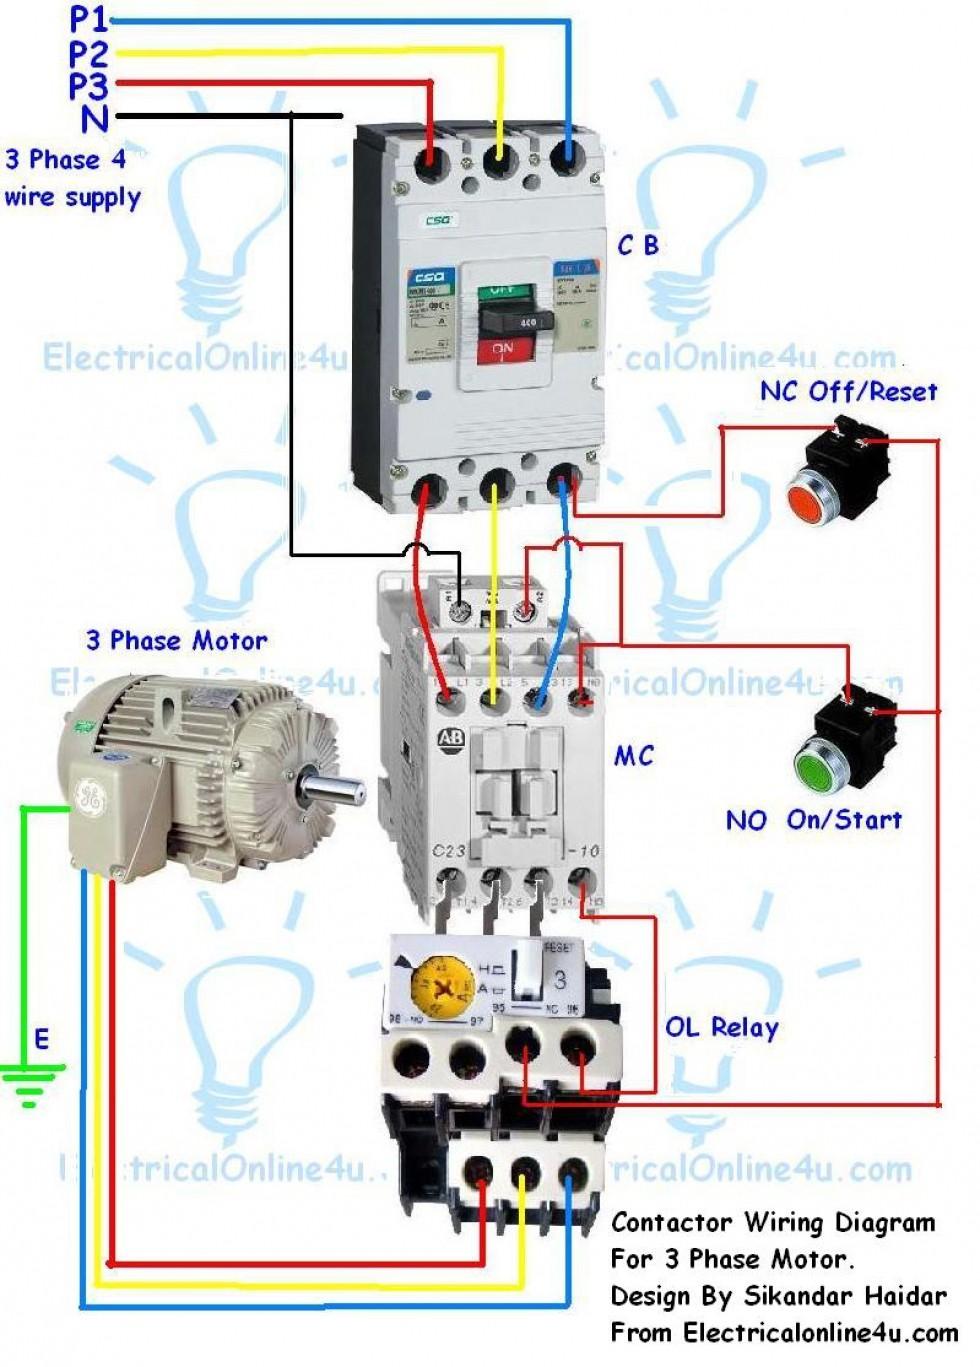 wiring diagram 3 phase contactor wiring diagram photo album wire rh beinclover co